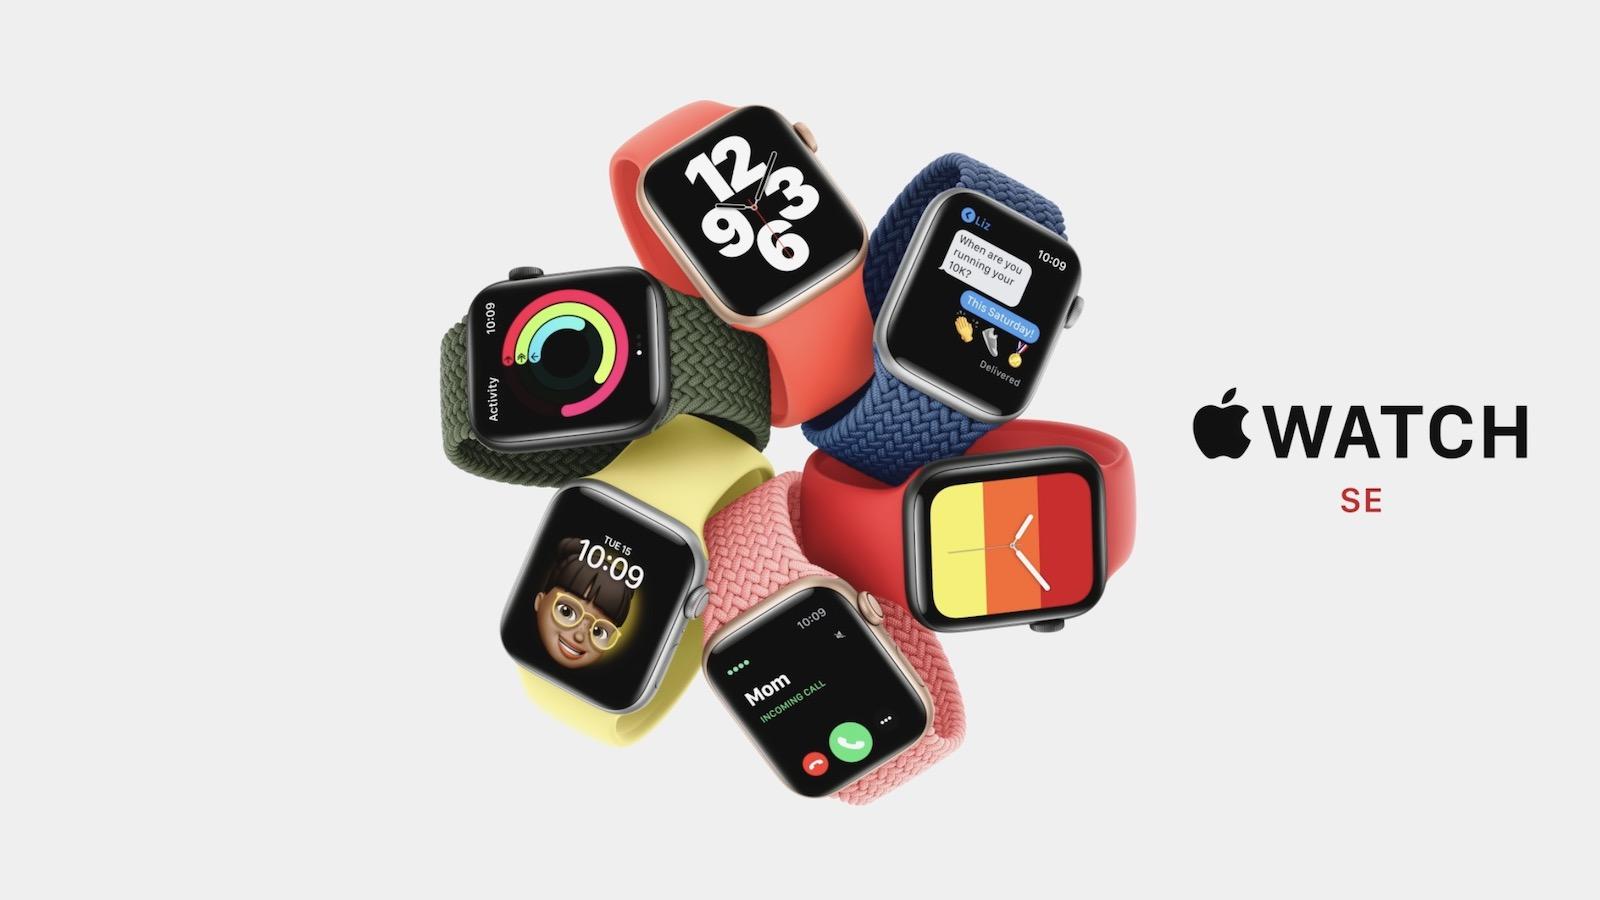 「Apple Watch SE」発表。発売日・価格・新機能まとめ